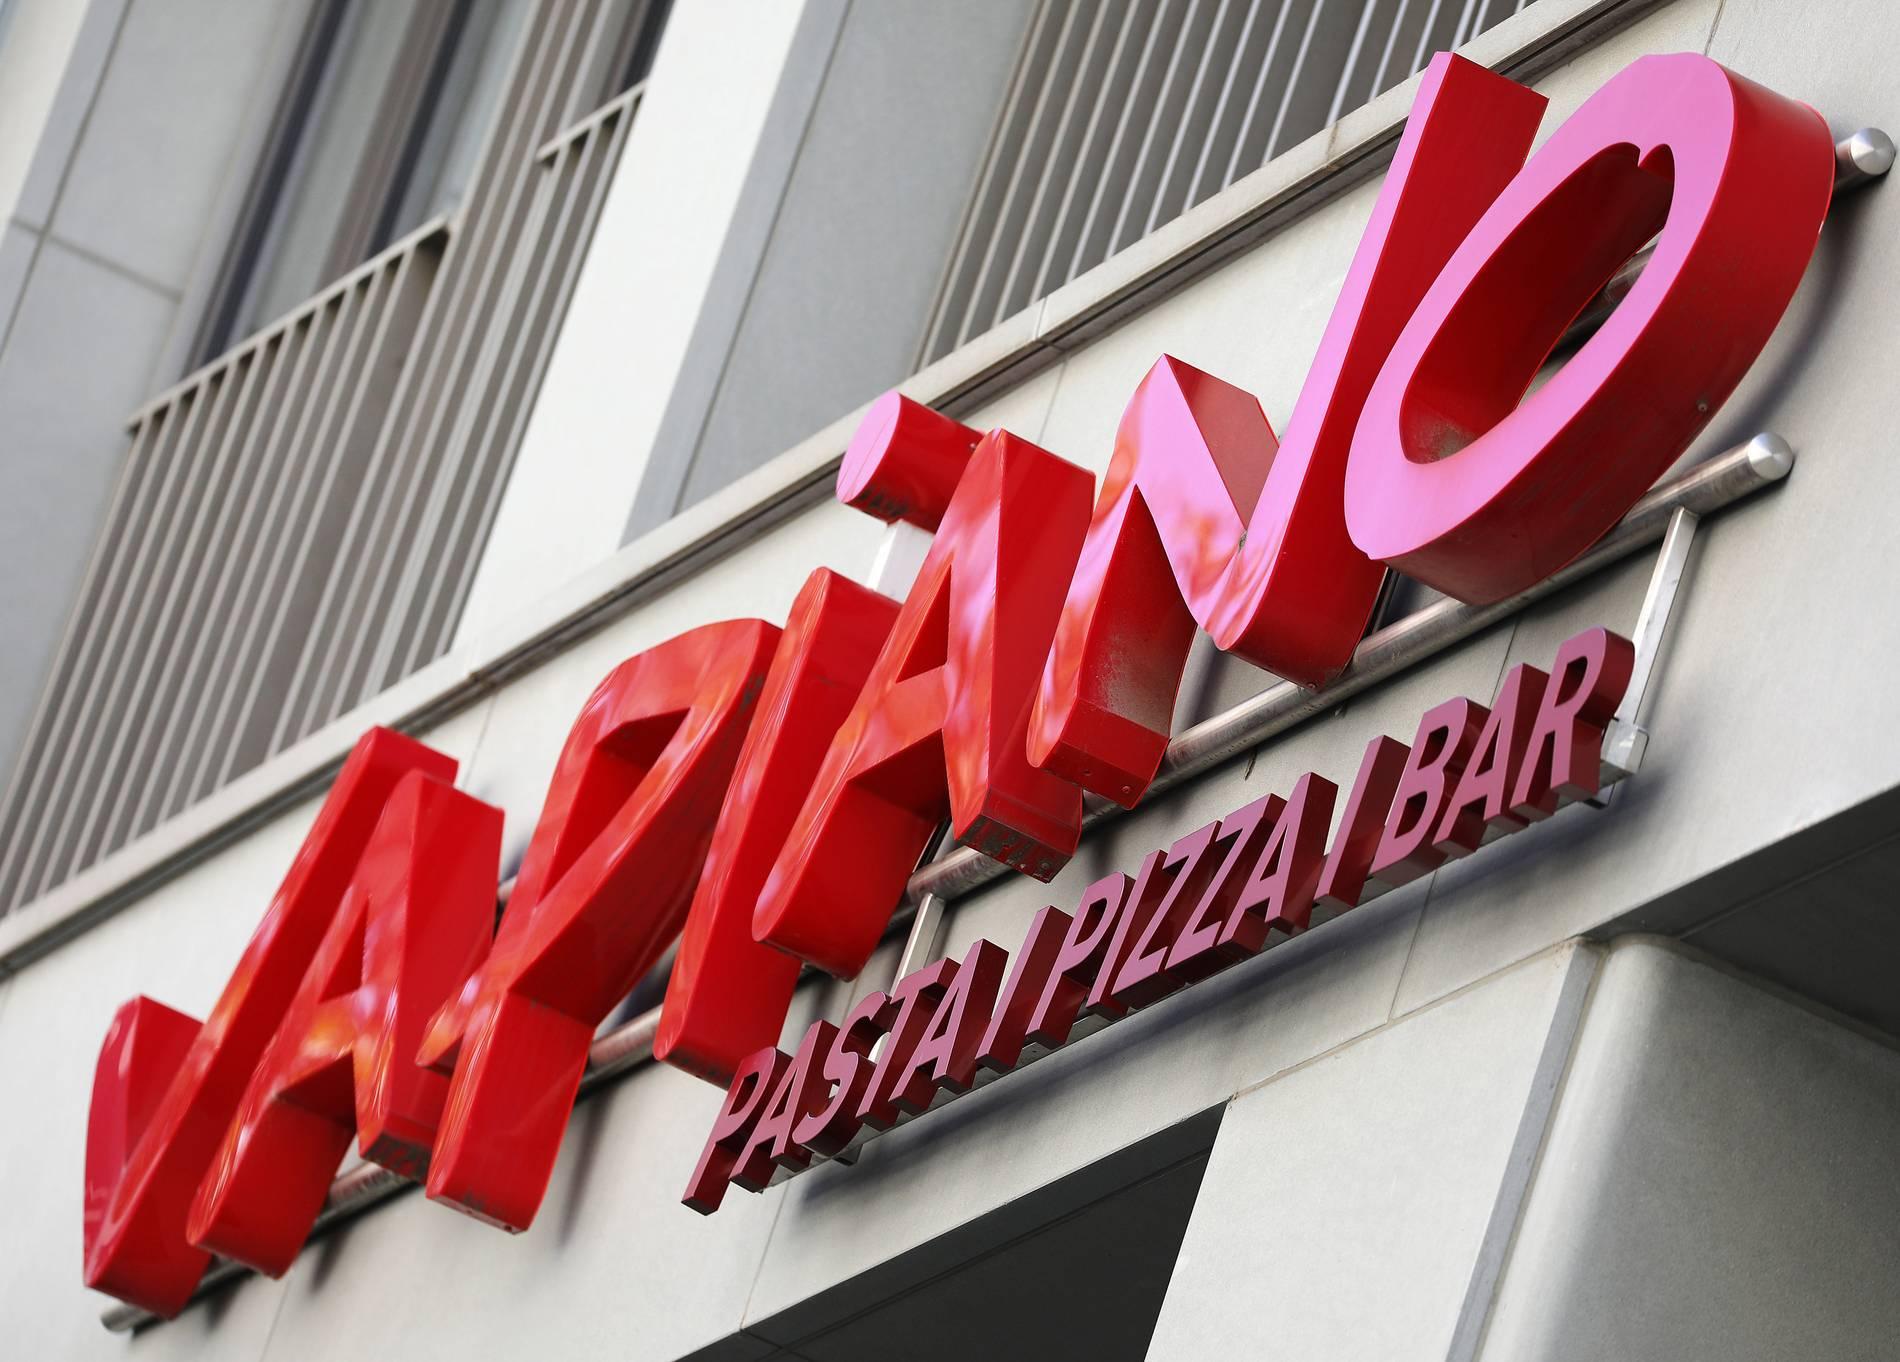 Corona News Deutschland: Insolvenz wegen Corona: Restaurantkette Vapiano ist zahlungsunfähig